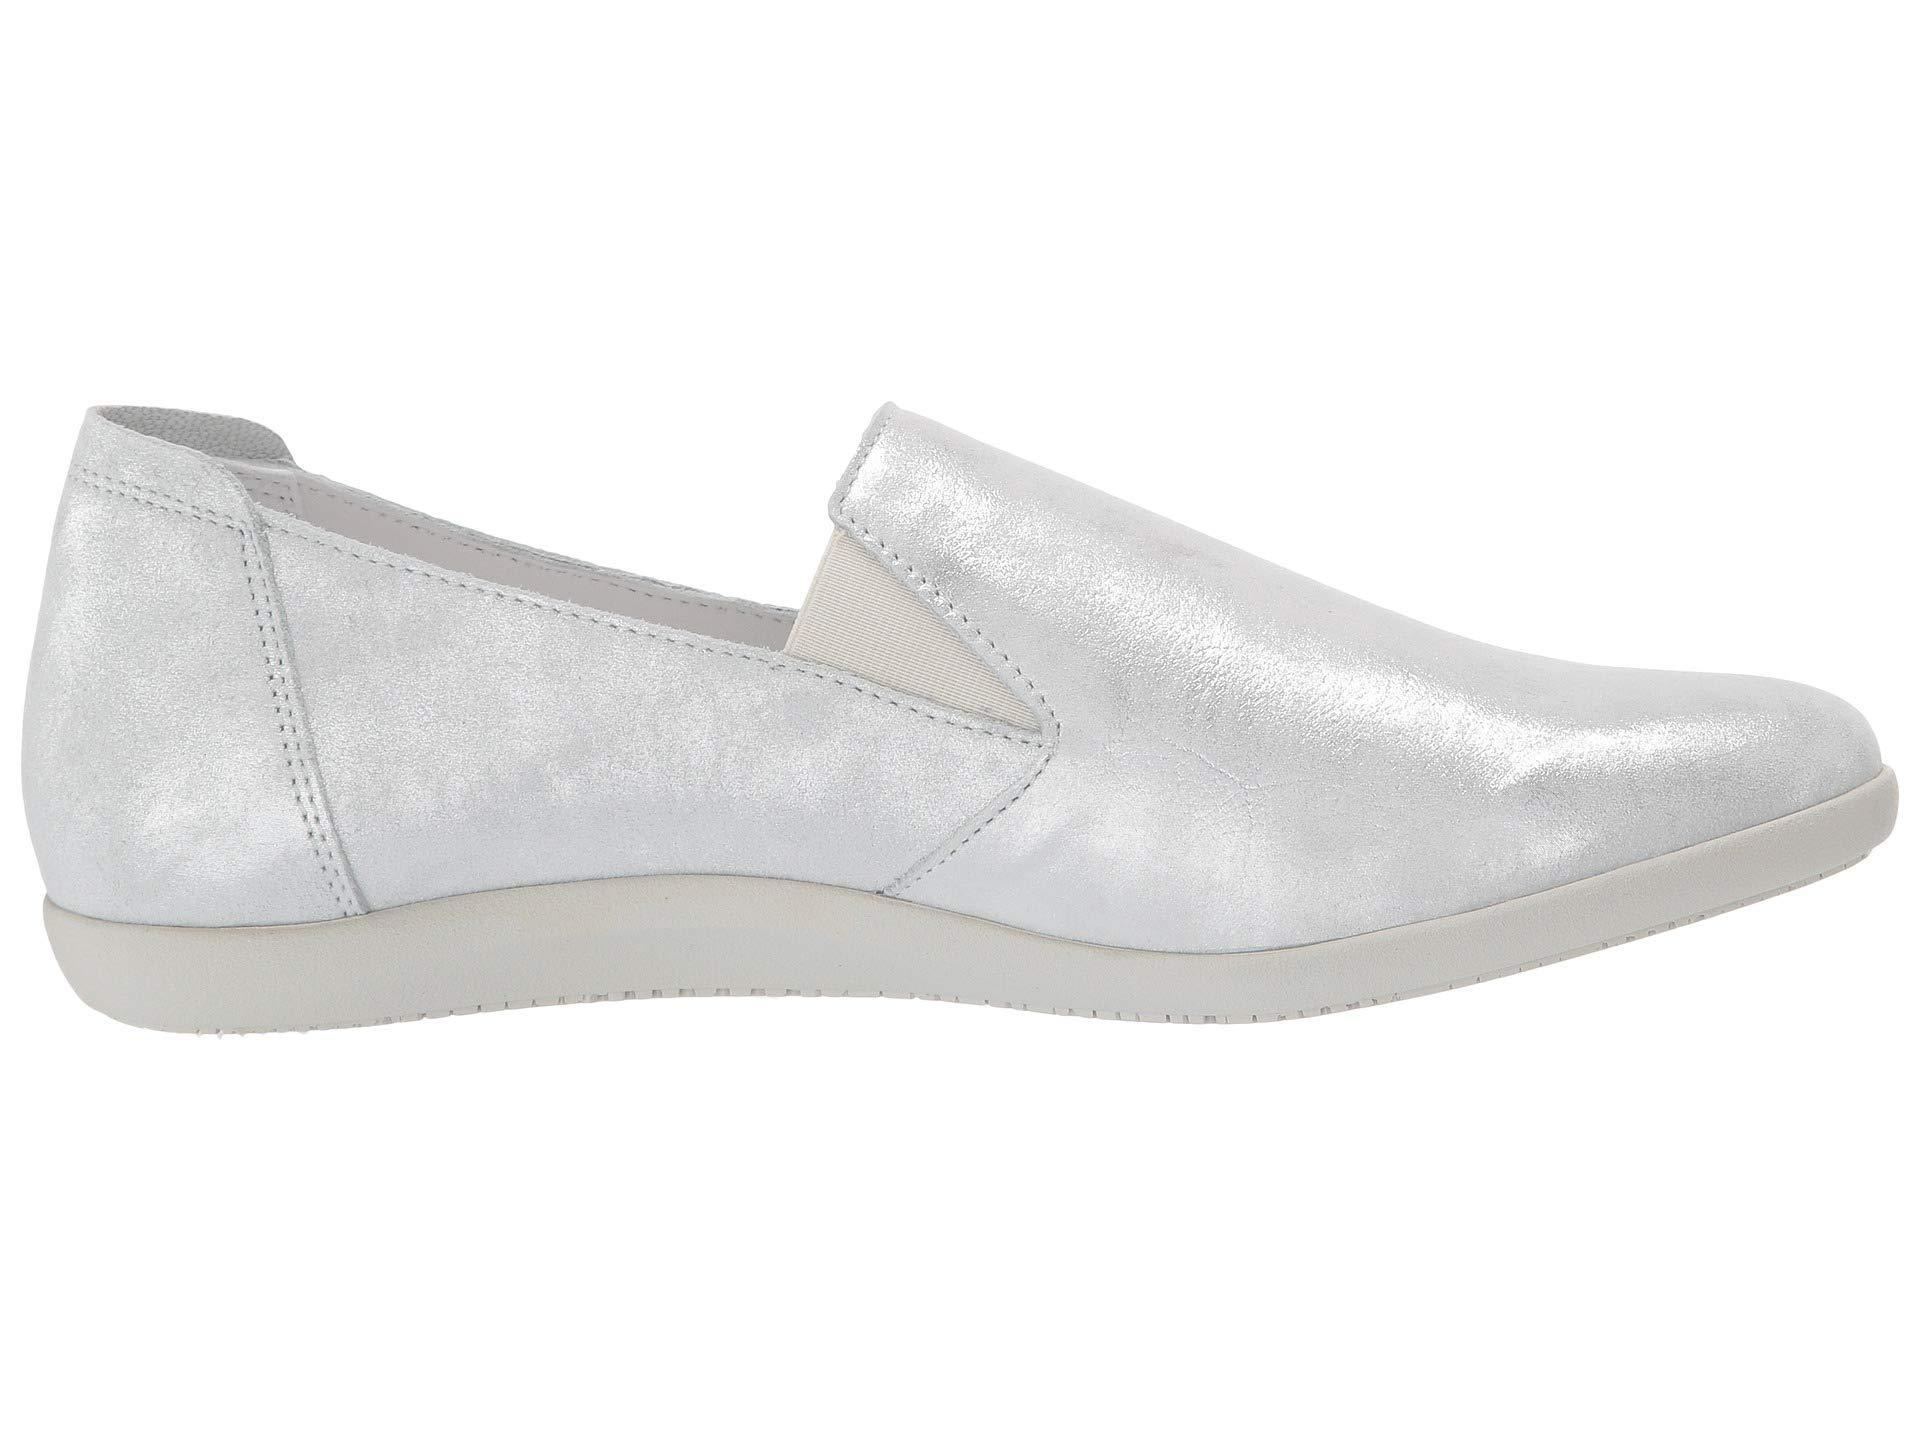 ef9a522a67a Lyst - Mephisto Korie (navy Silk) Women's Shoes in Metallic